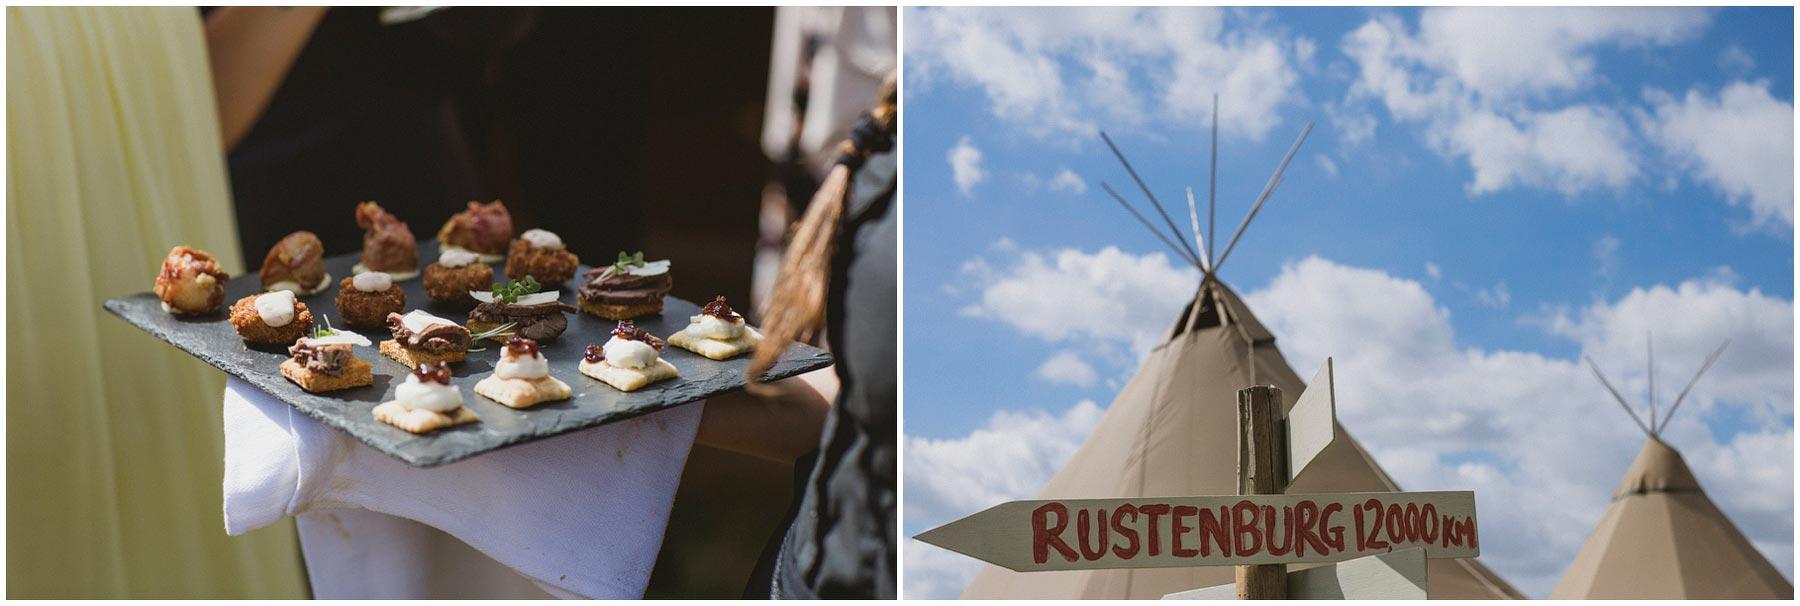 Kent-Festival-Tipi-wedding-photography_0092